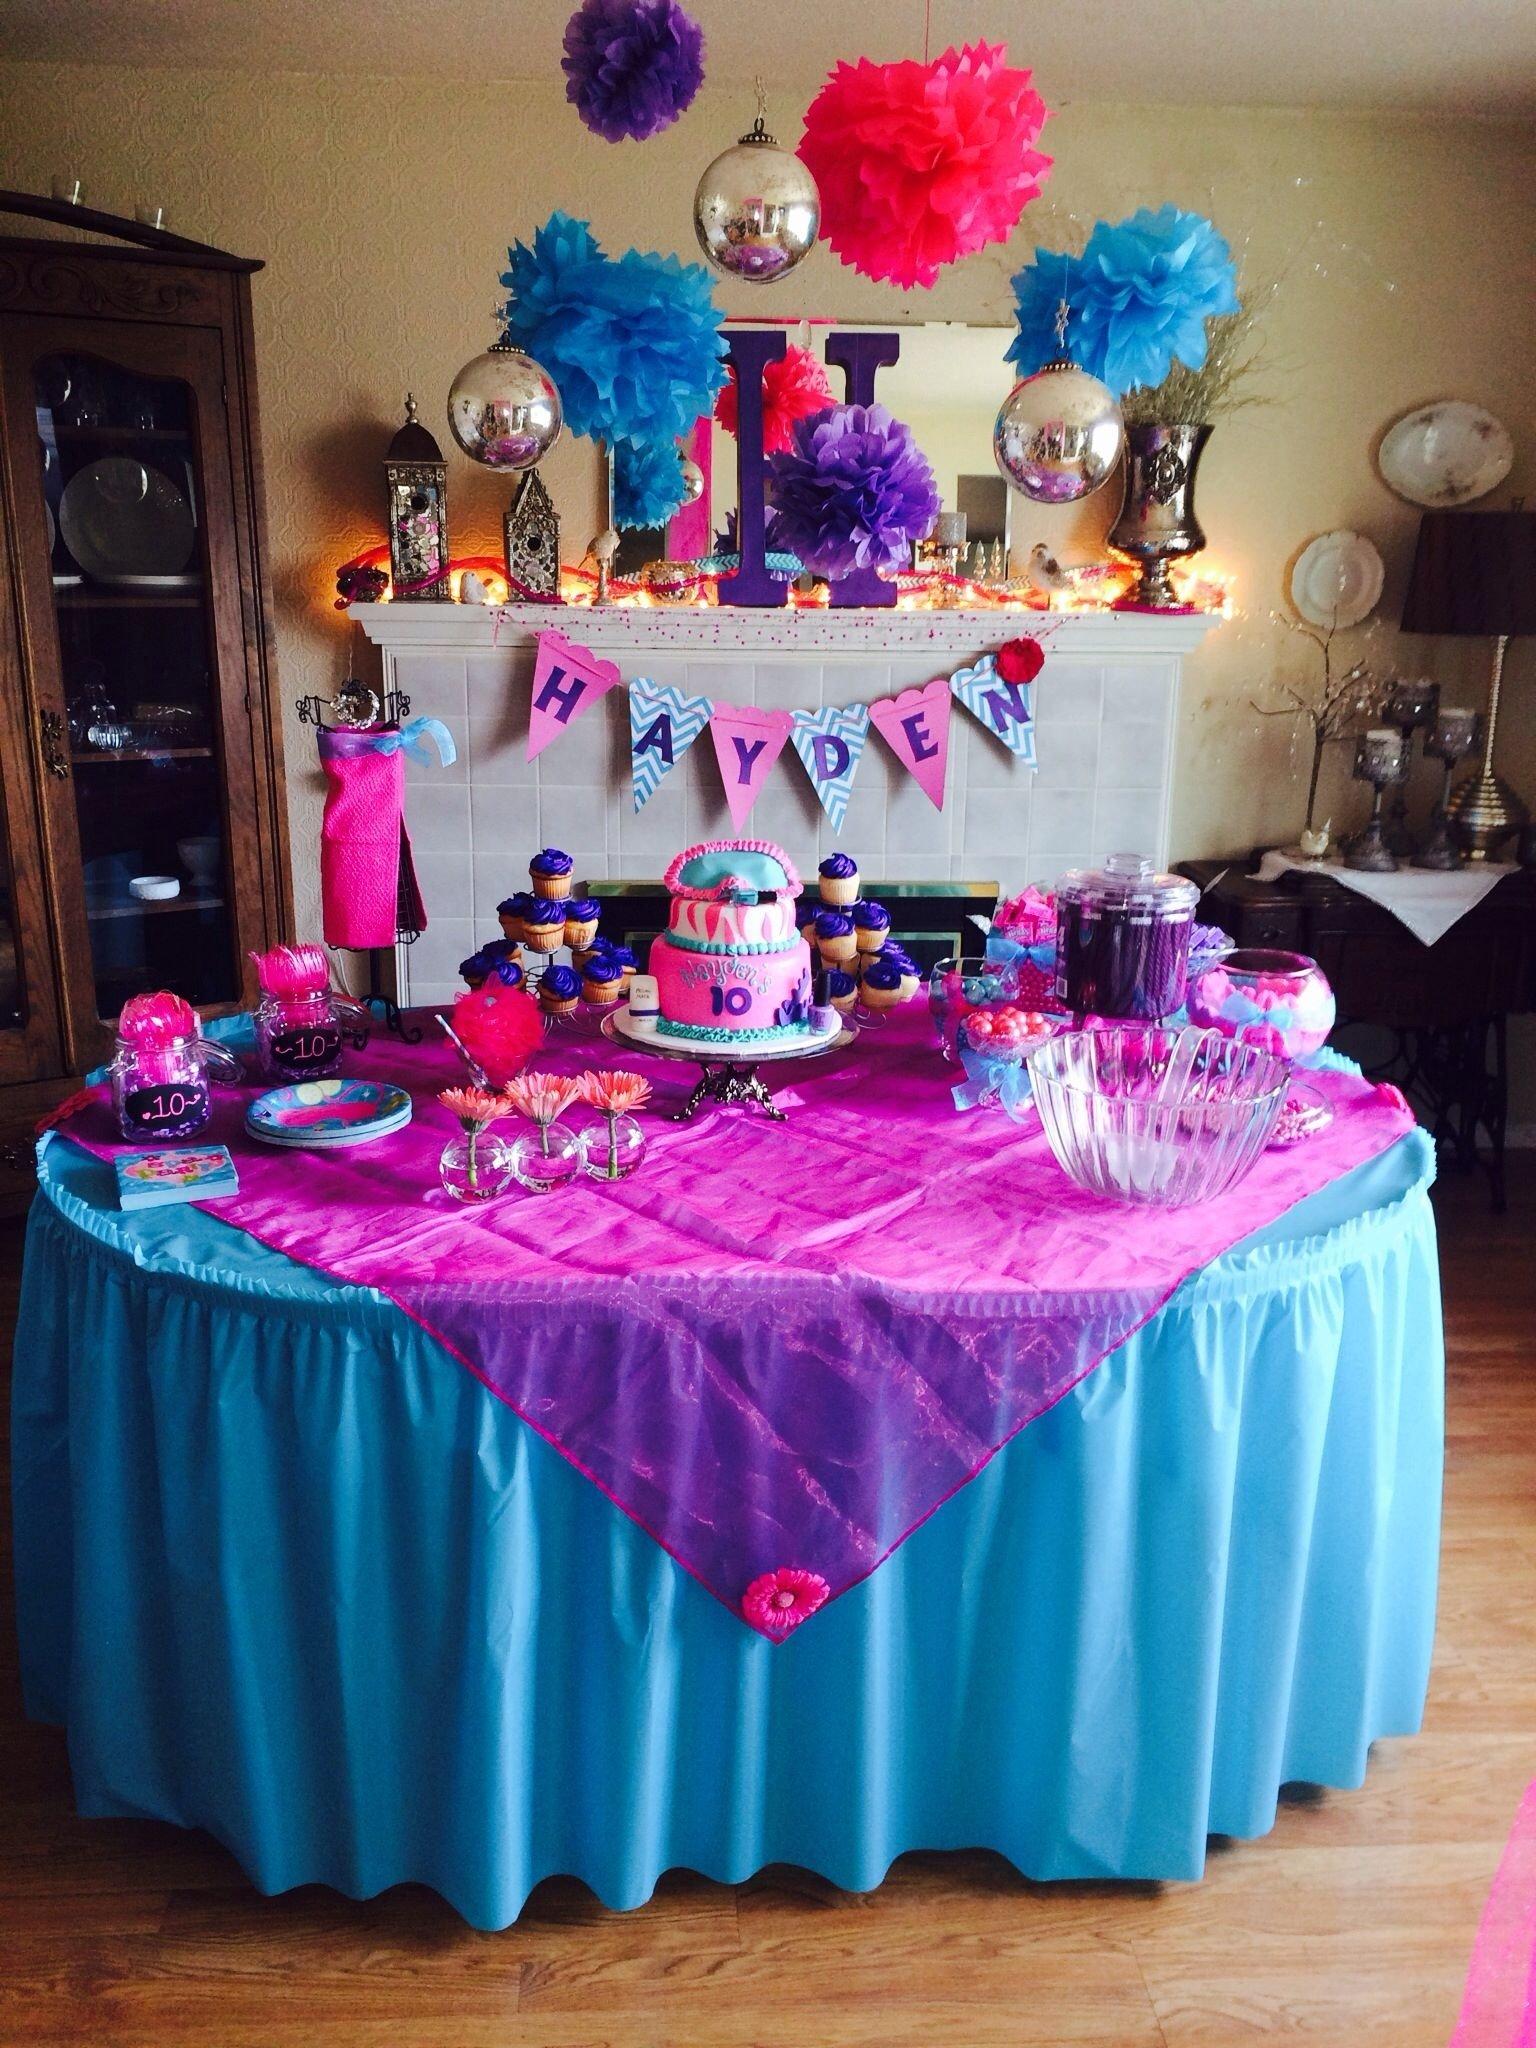 10 Trendy 10 Yr Old Girl Birthday Party Ideas girls 10th birthday party party ideas pinterest 10th birthday 6 2020